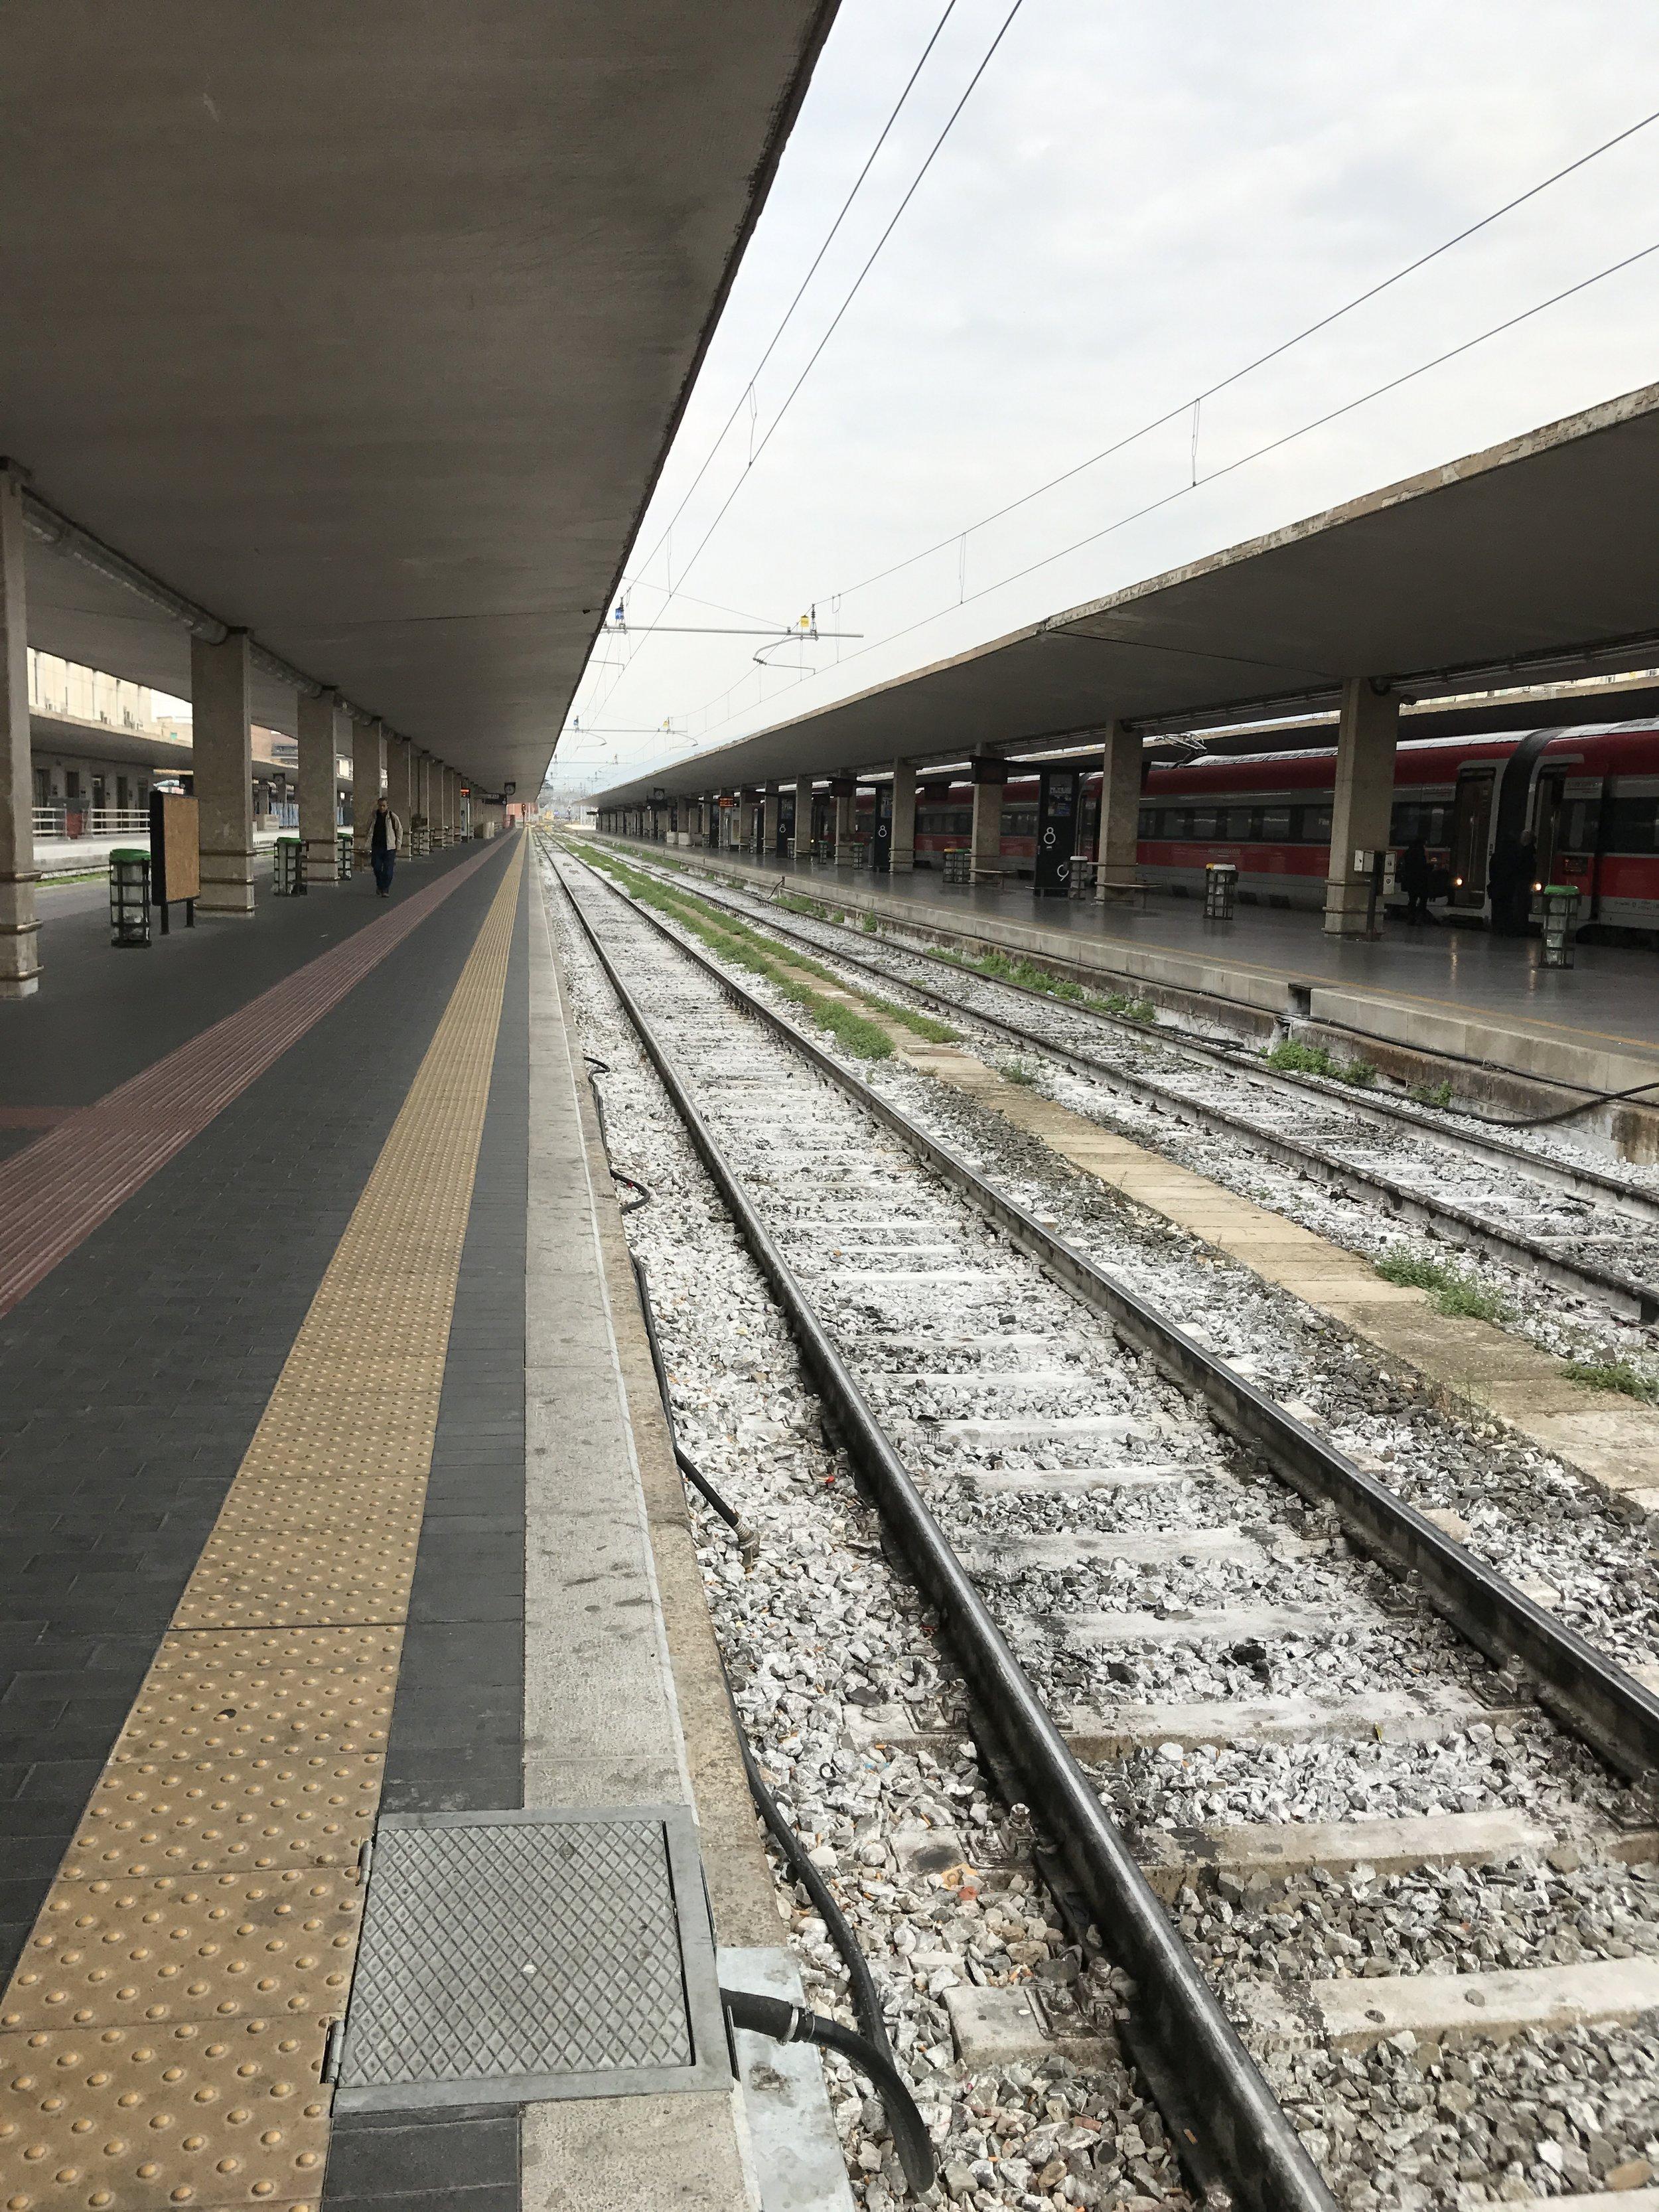 The tracks at Firenze SMN